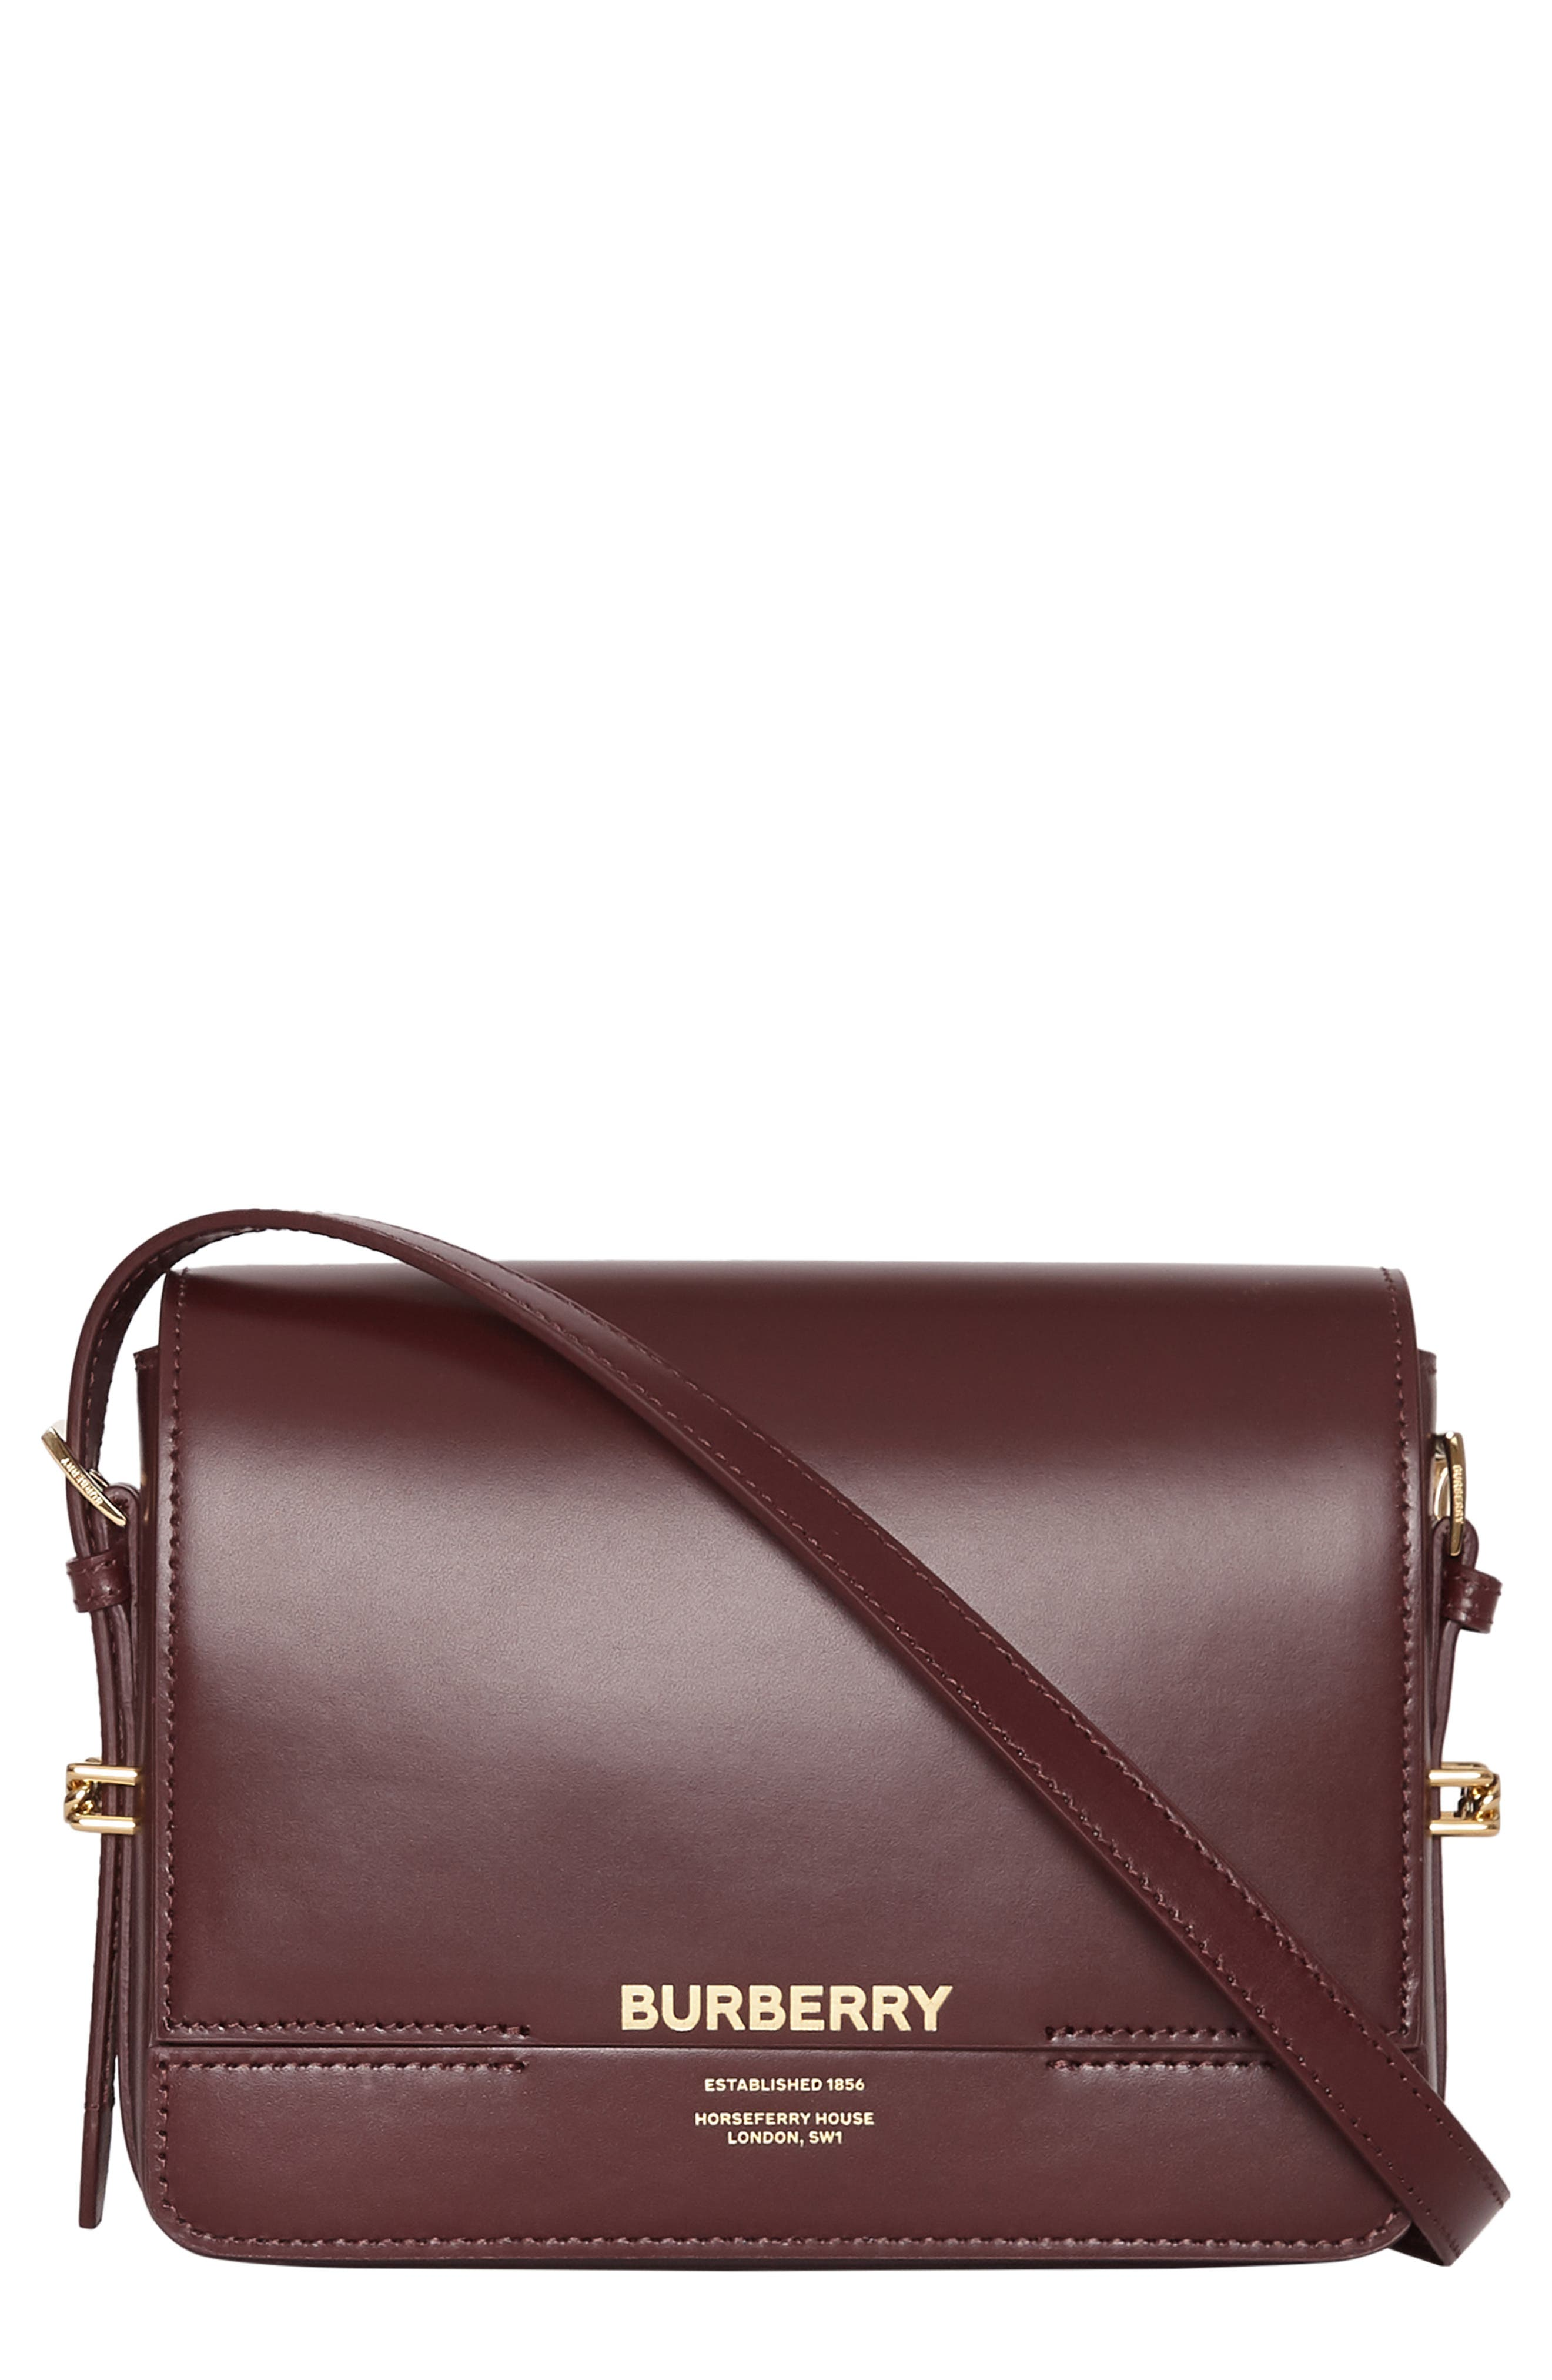 07f3b567bfe Burberry Crossbody Bags | Nordstrom